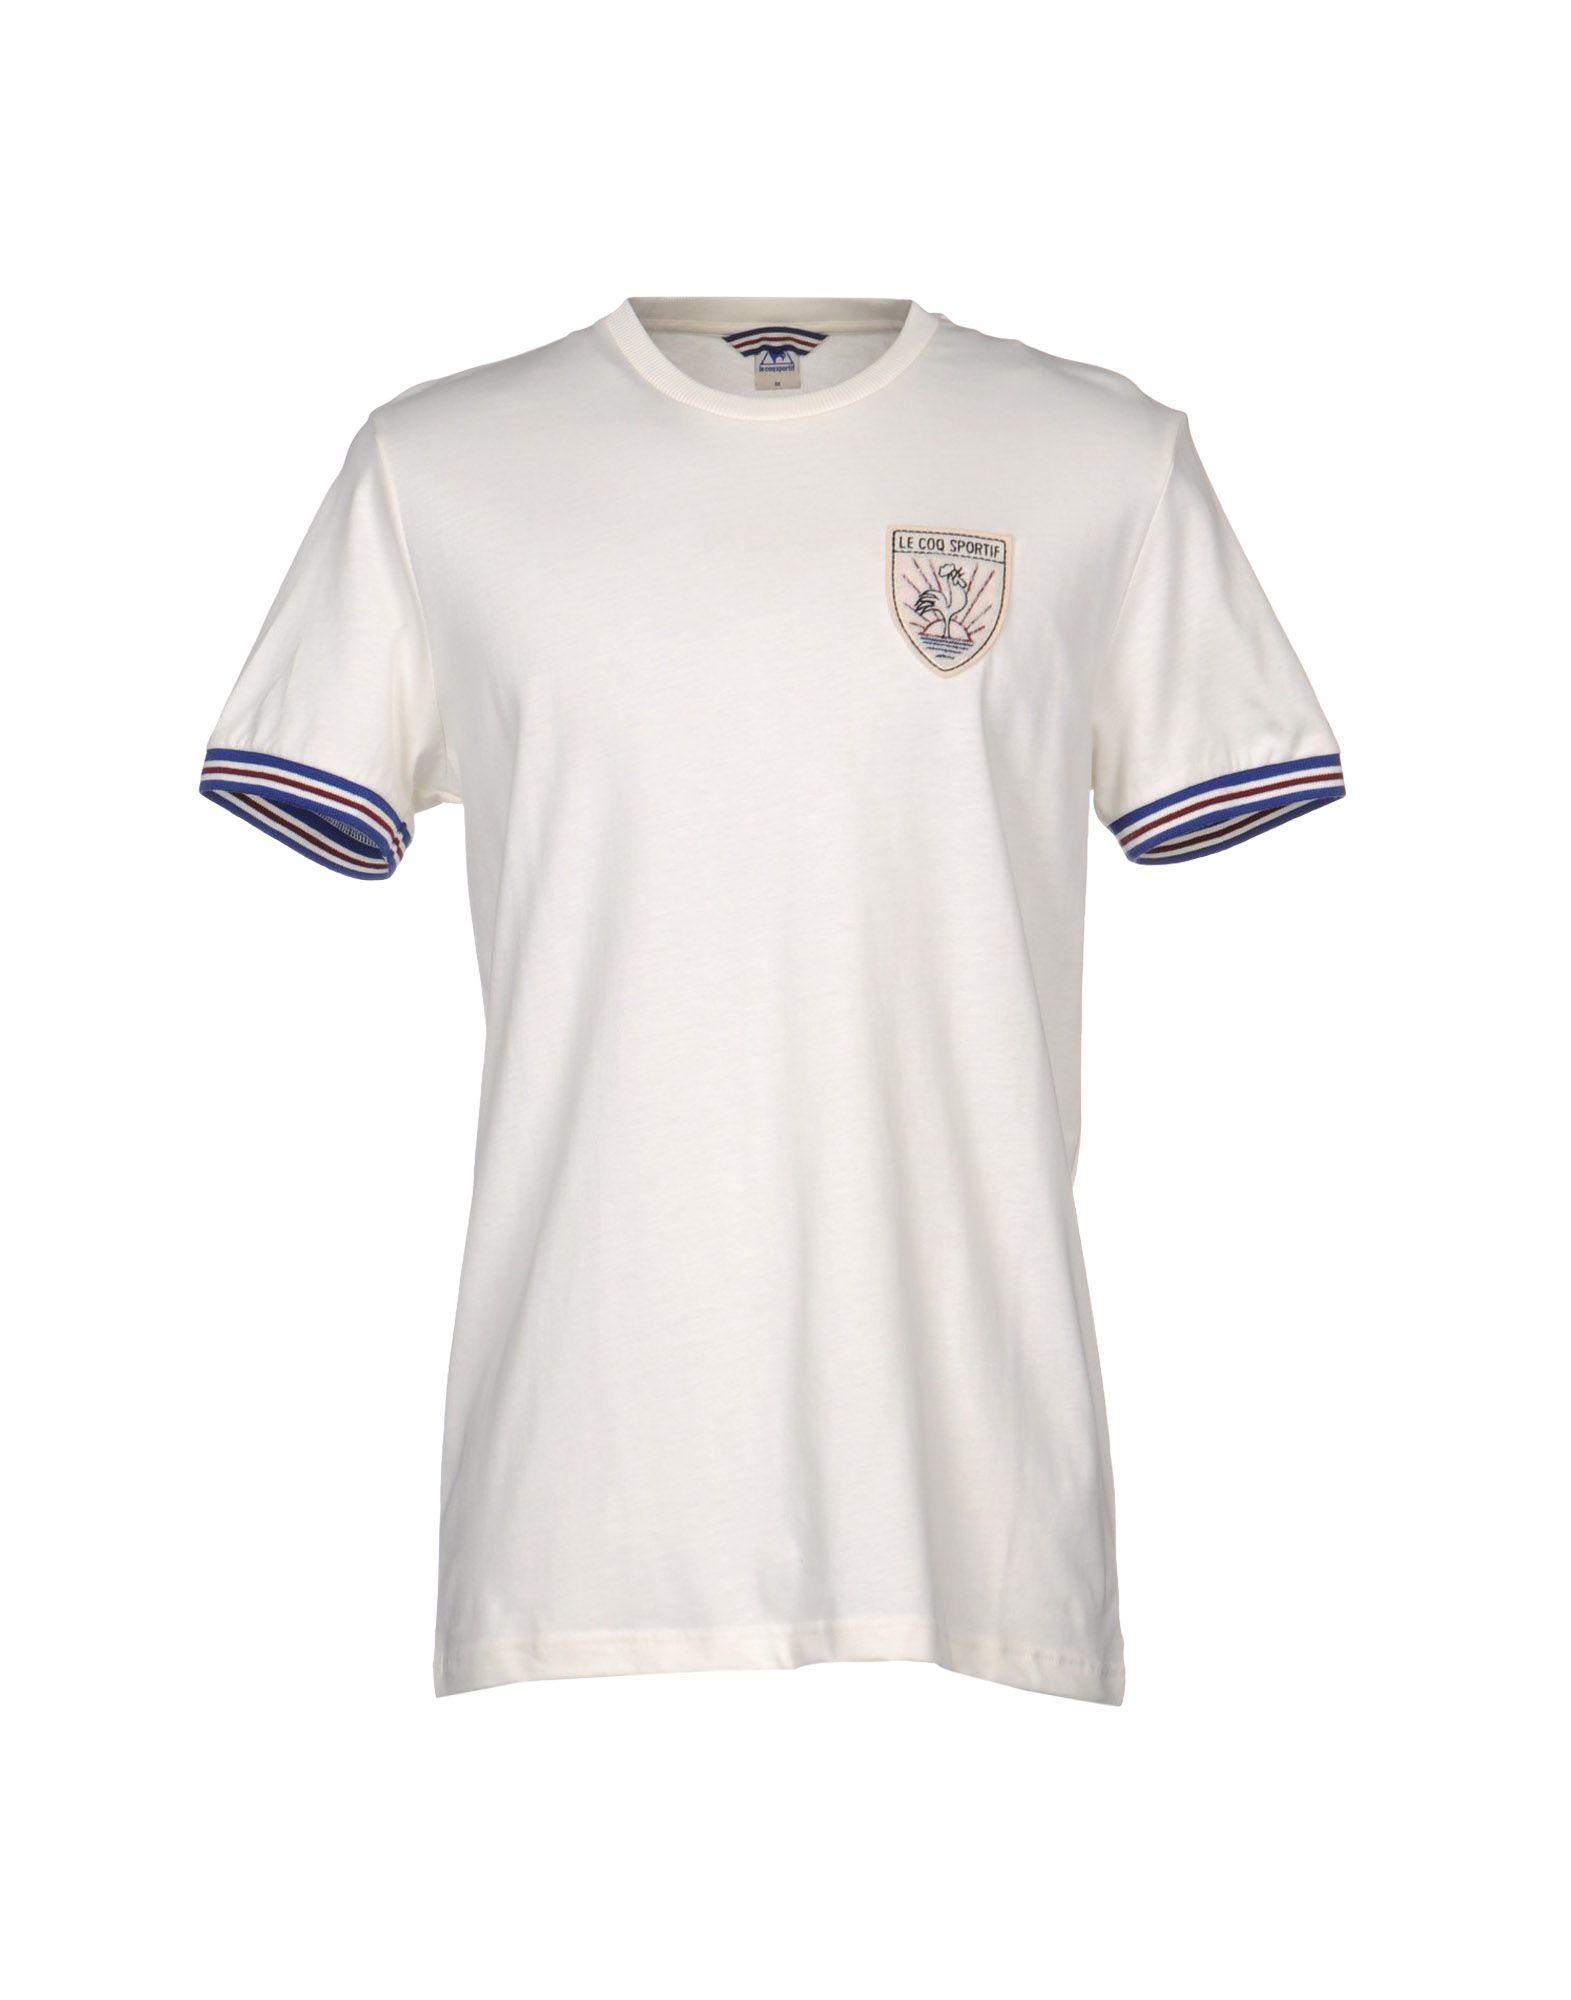 le coq sportif shirt - photo #20